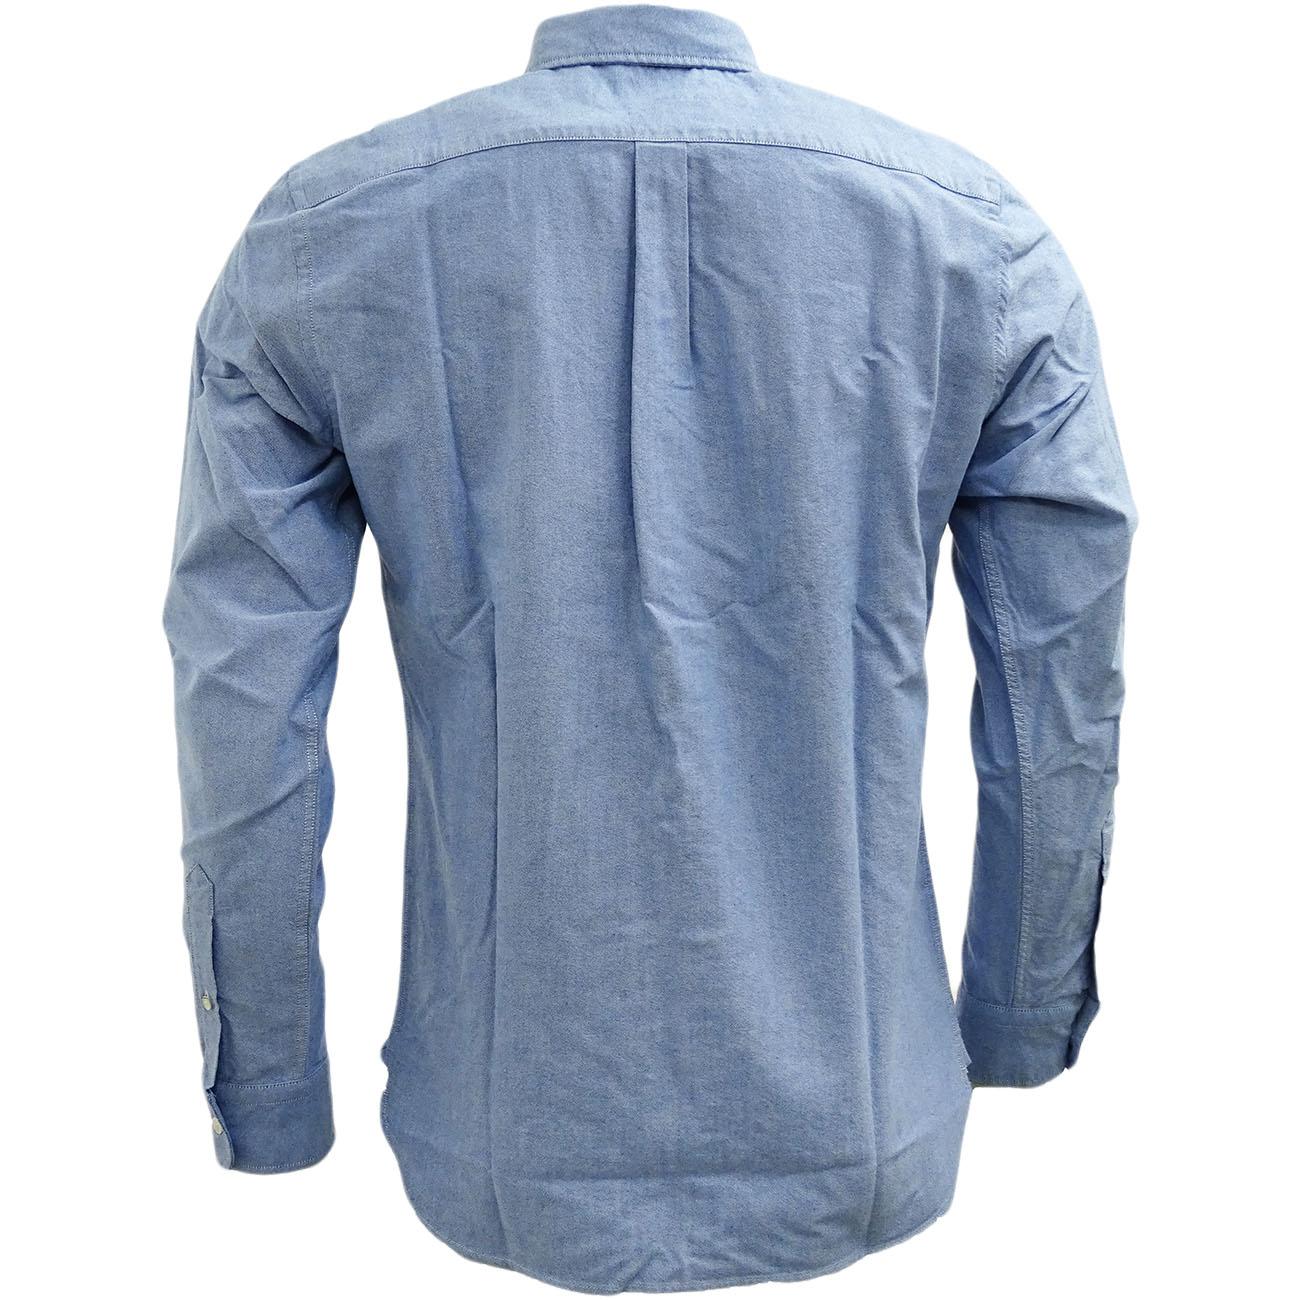 Levi strauss shirt ebay for Levis plain t shirts